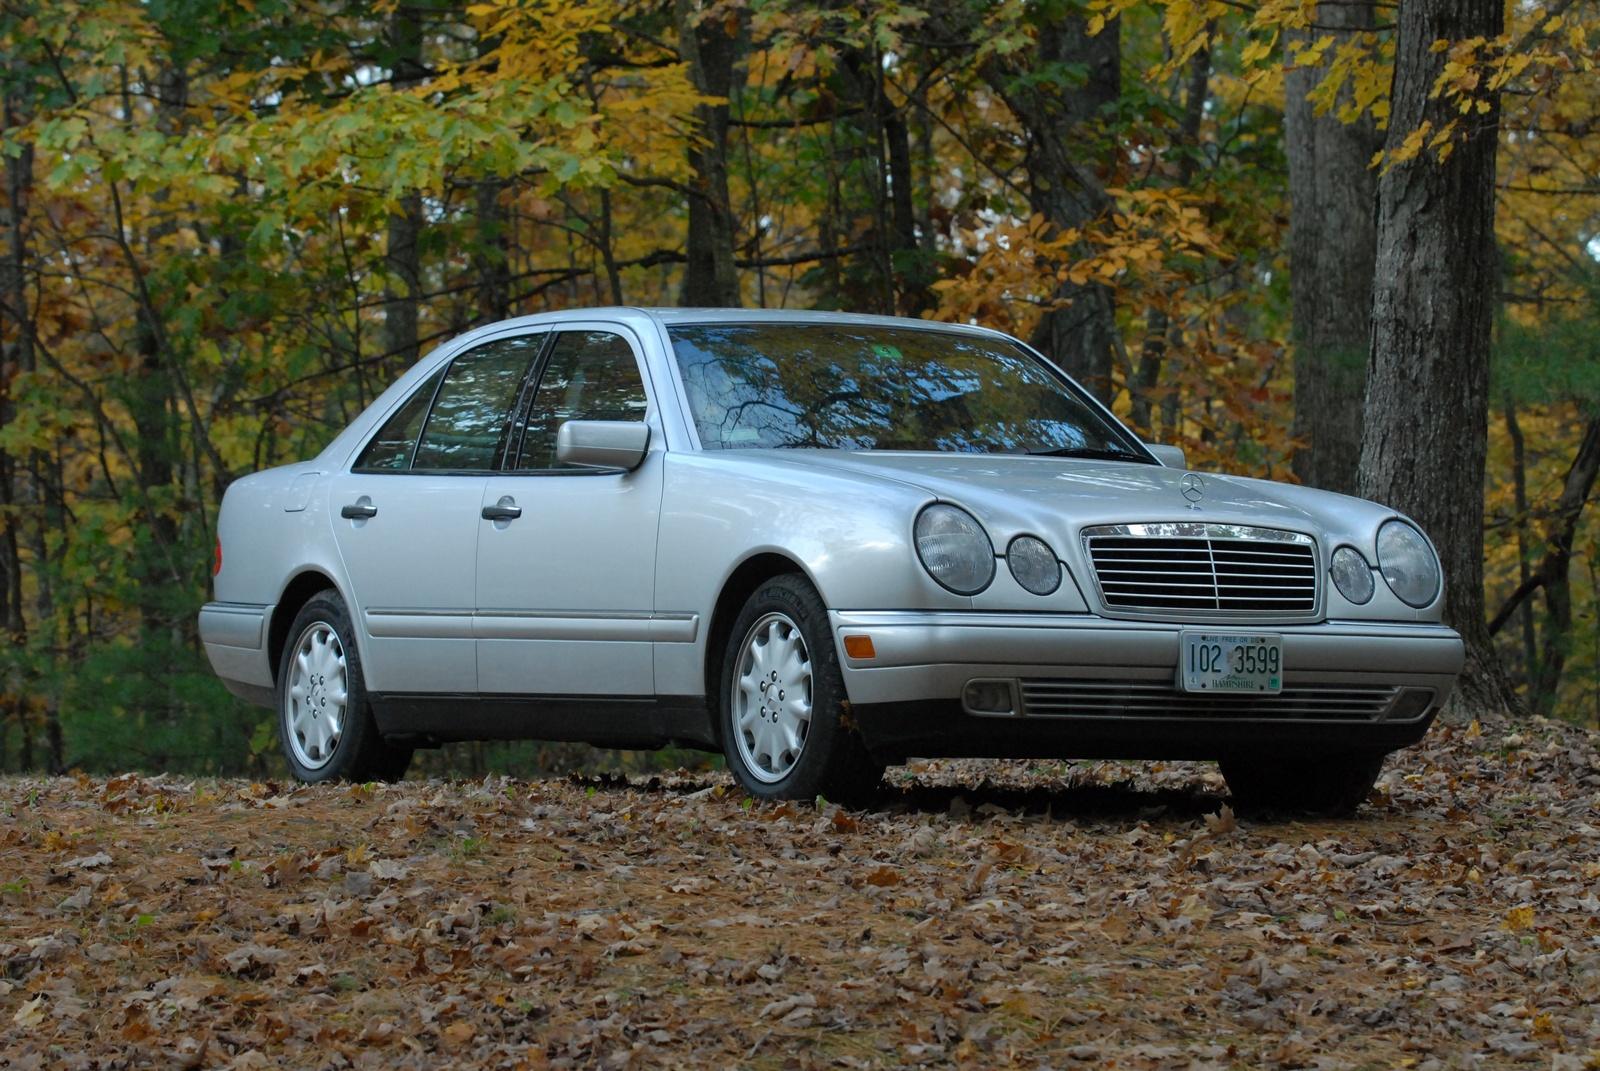 1998_mercedes-benz_e-class_4_dr_e300_sedan-pic-3236732861397403...